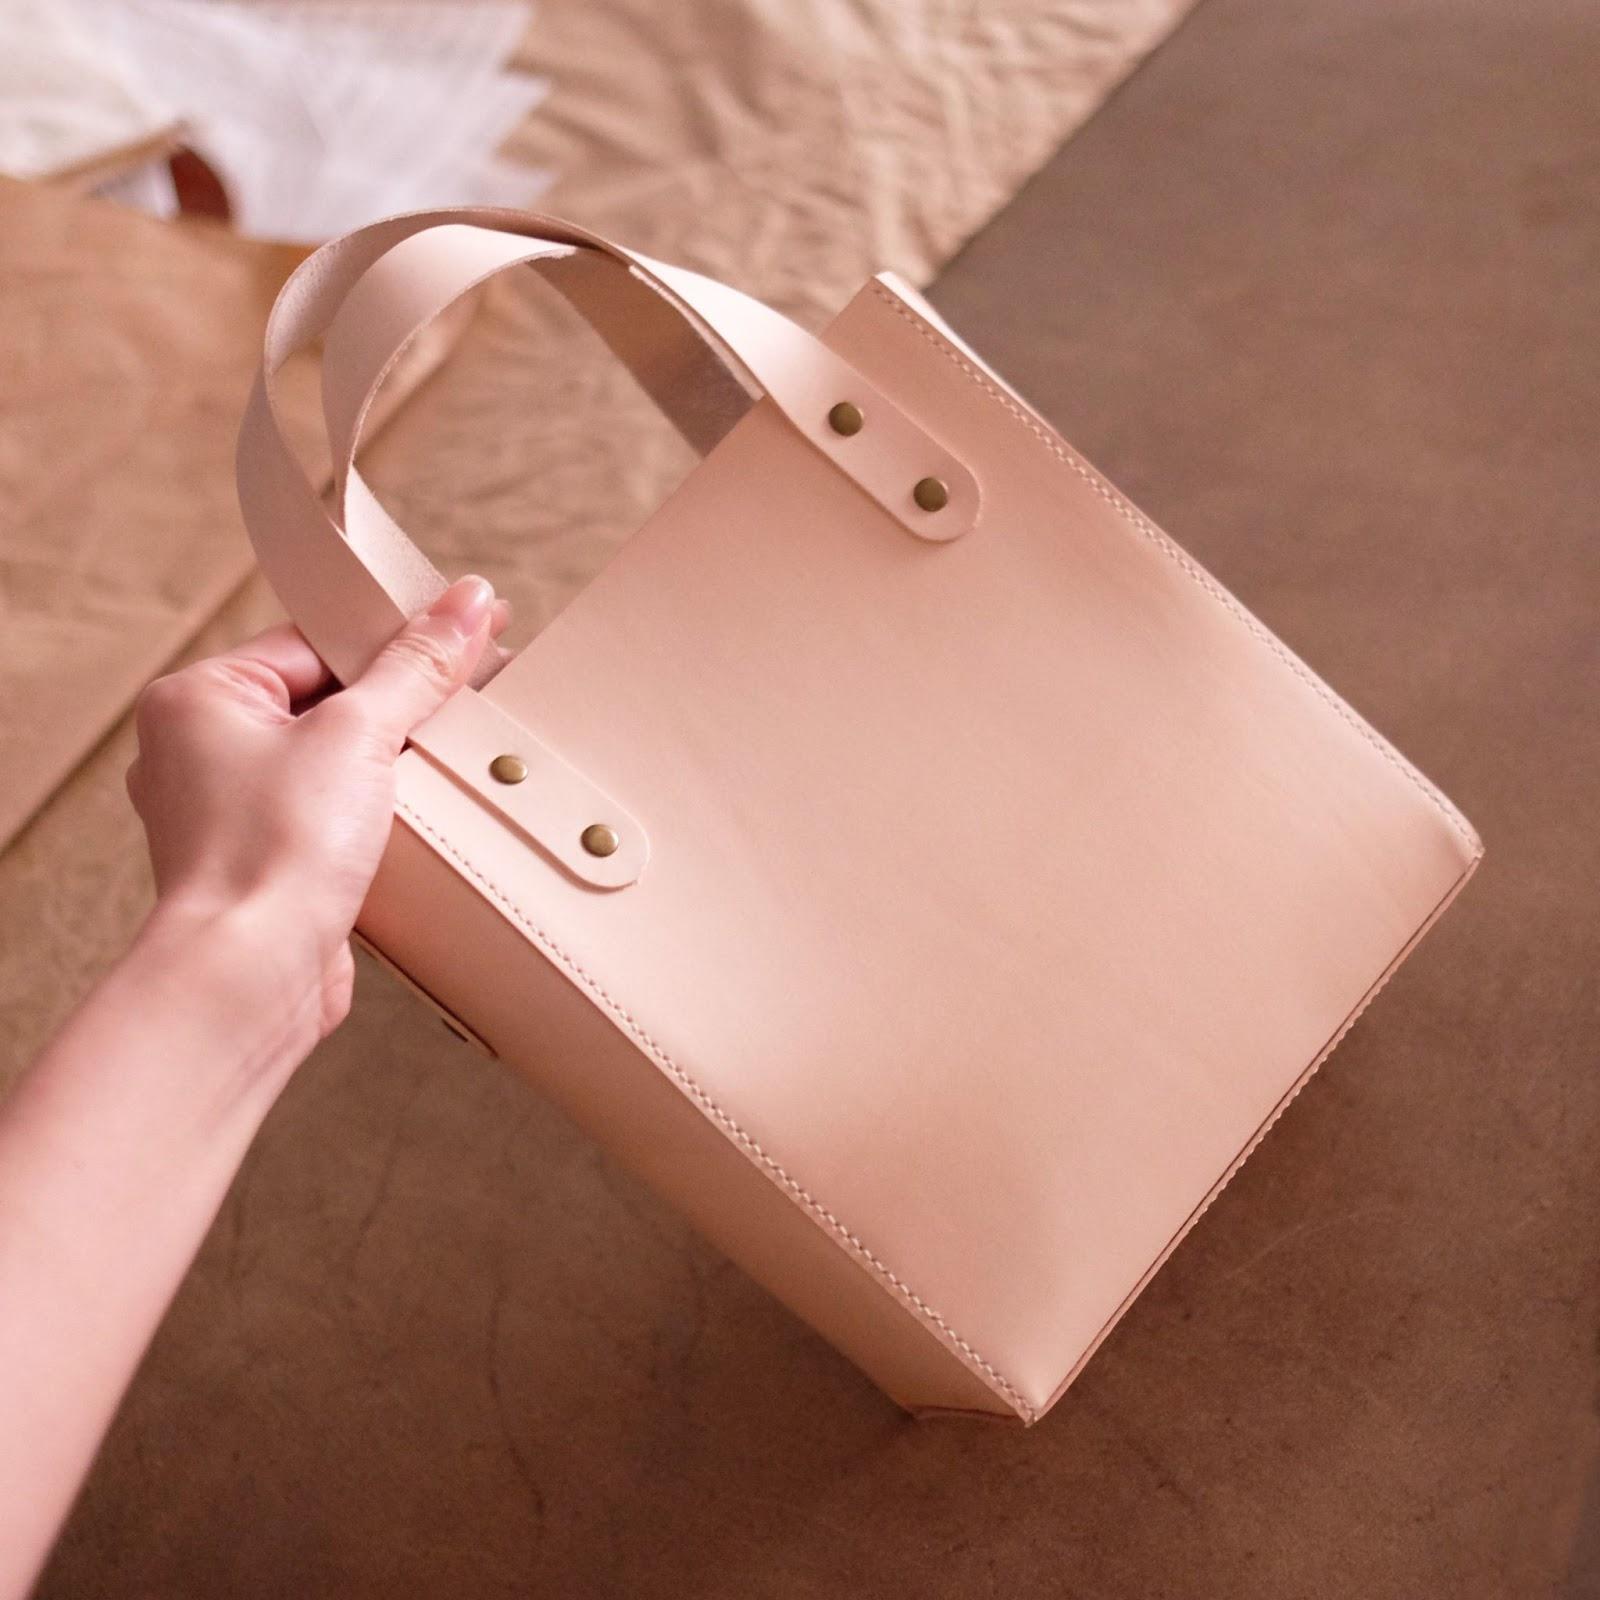 The Lederer bag